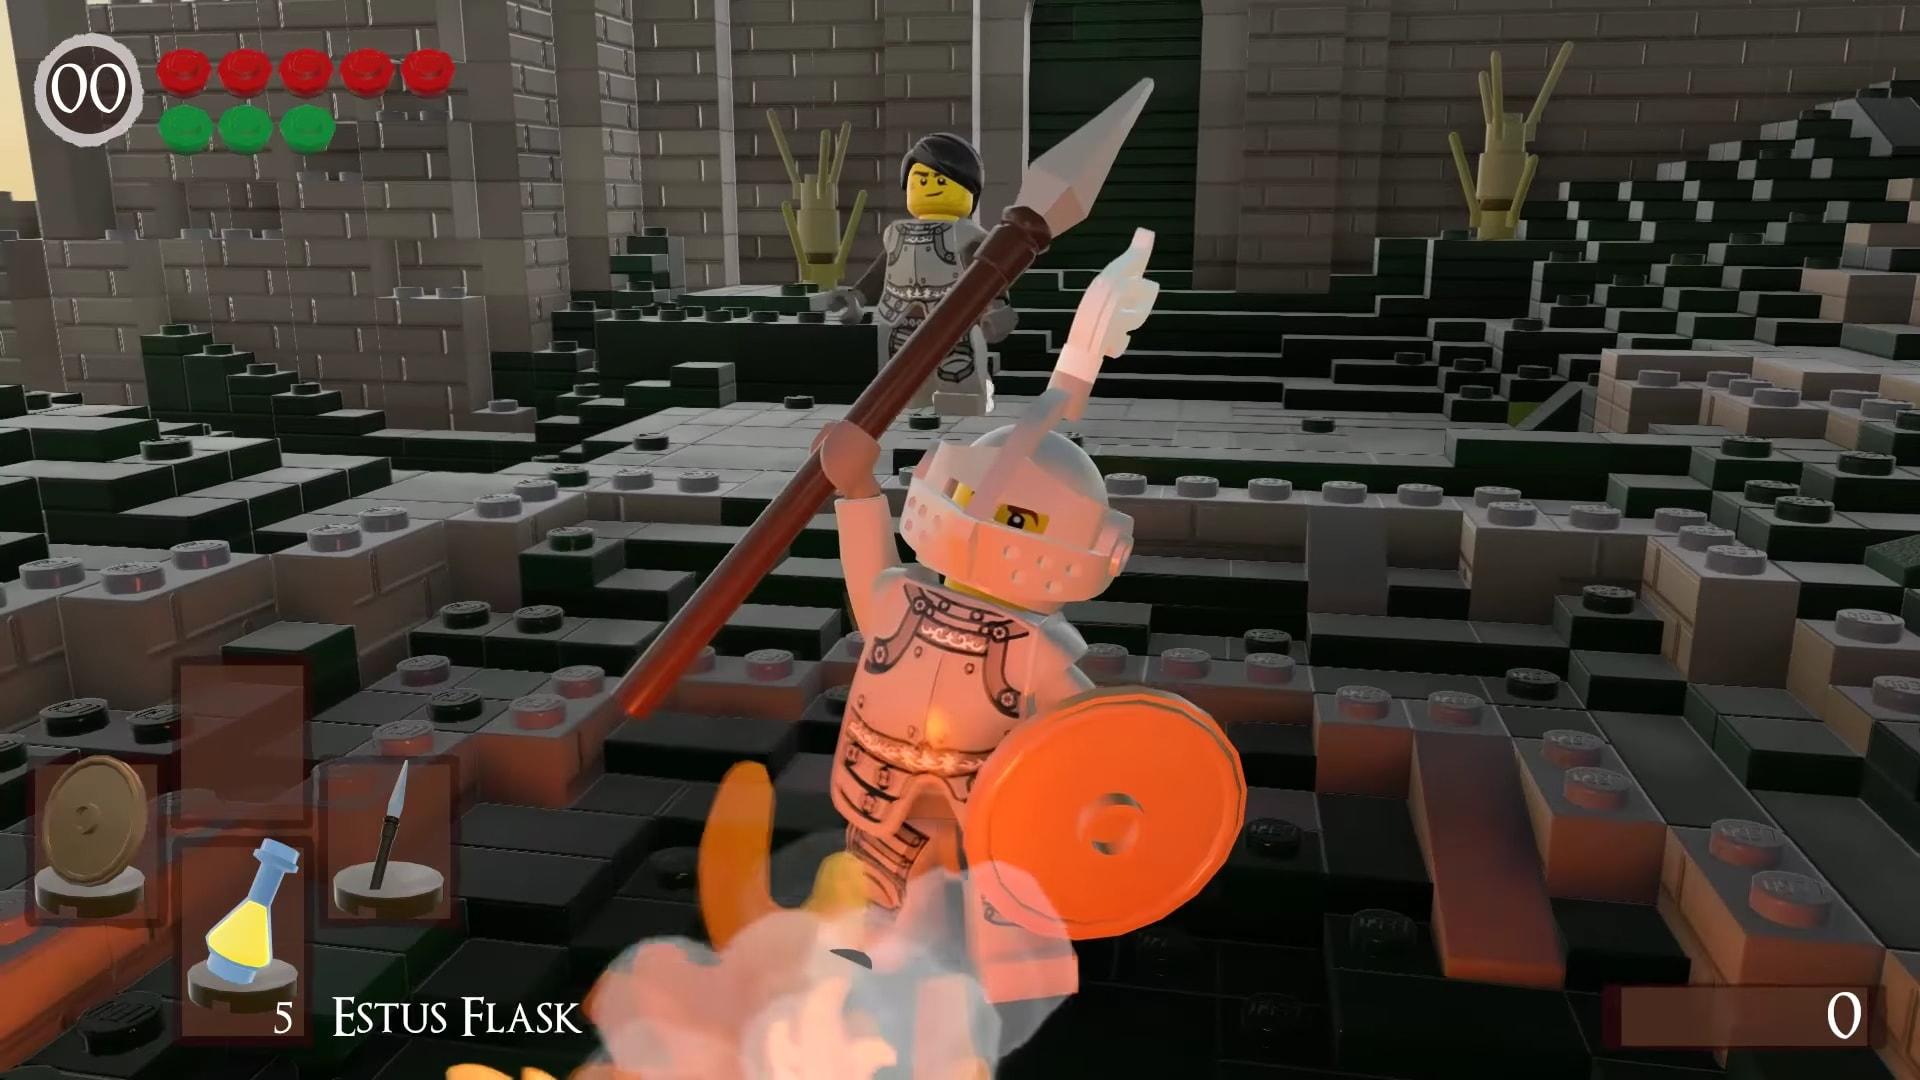 Dark Souls' Firelink Shrine looks snappy in Lego Worlds remake screenshot